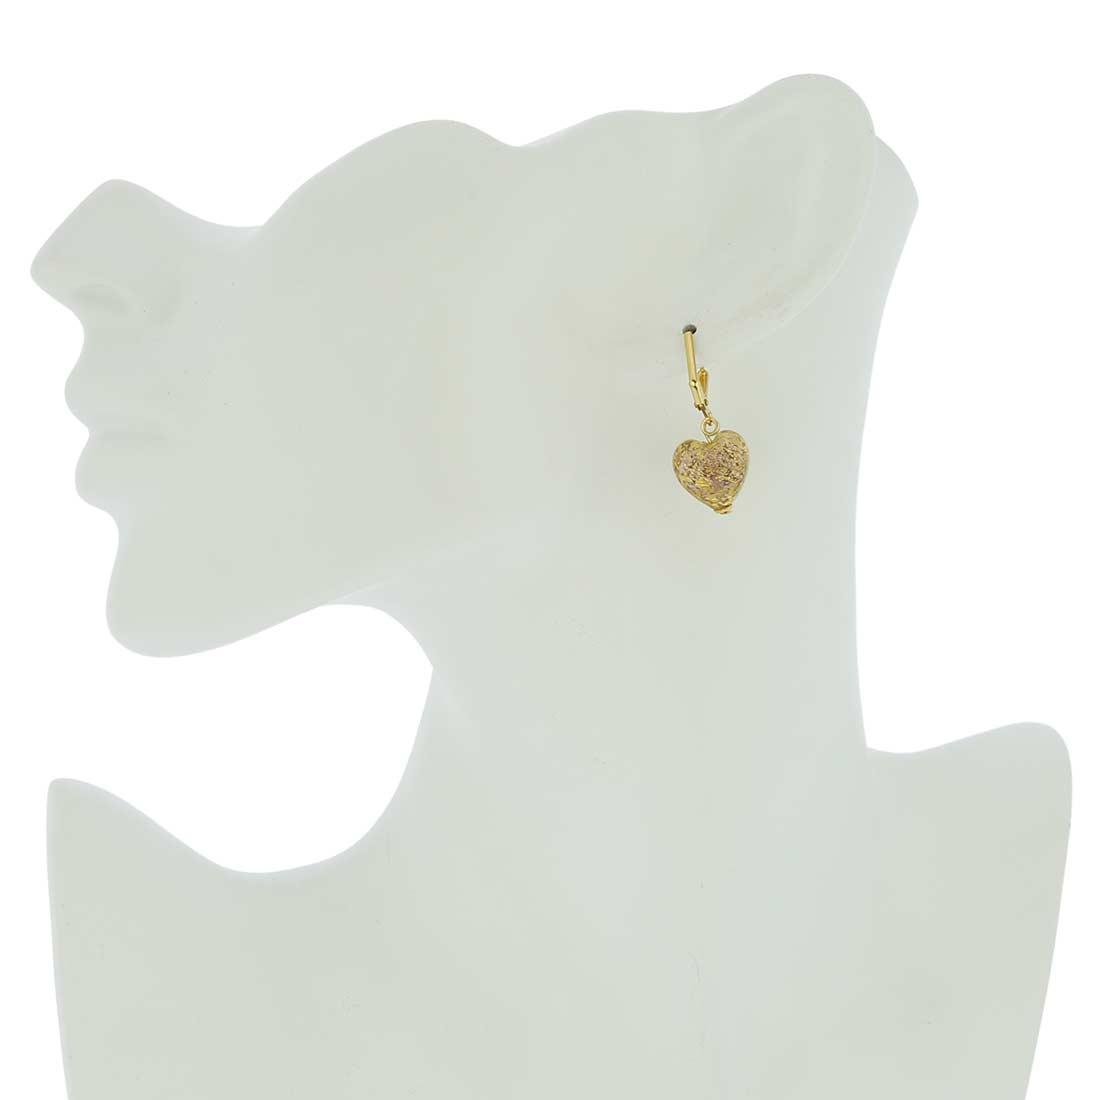 Ca D\'Oro Murano Heart earrings - Amethyst